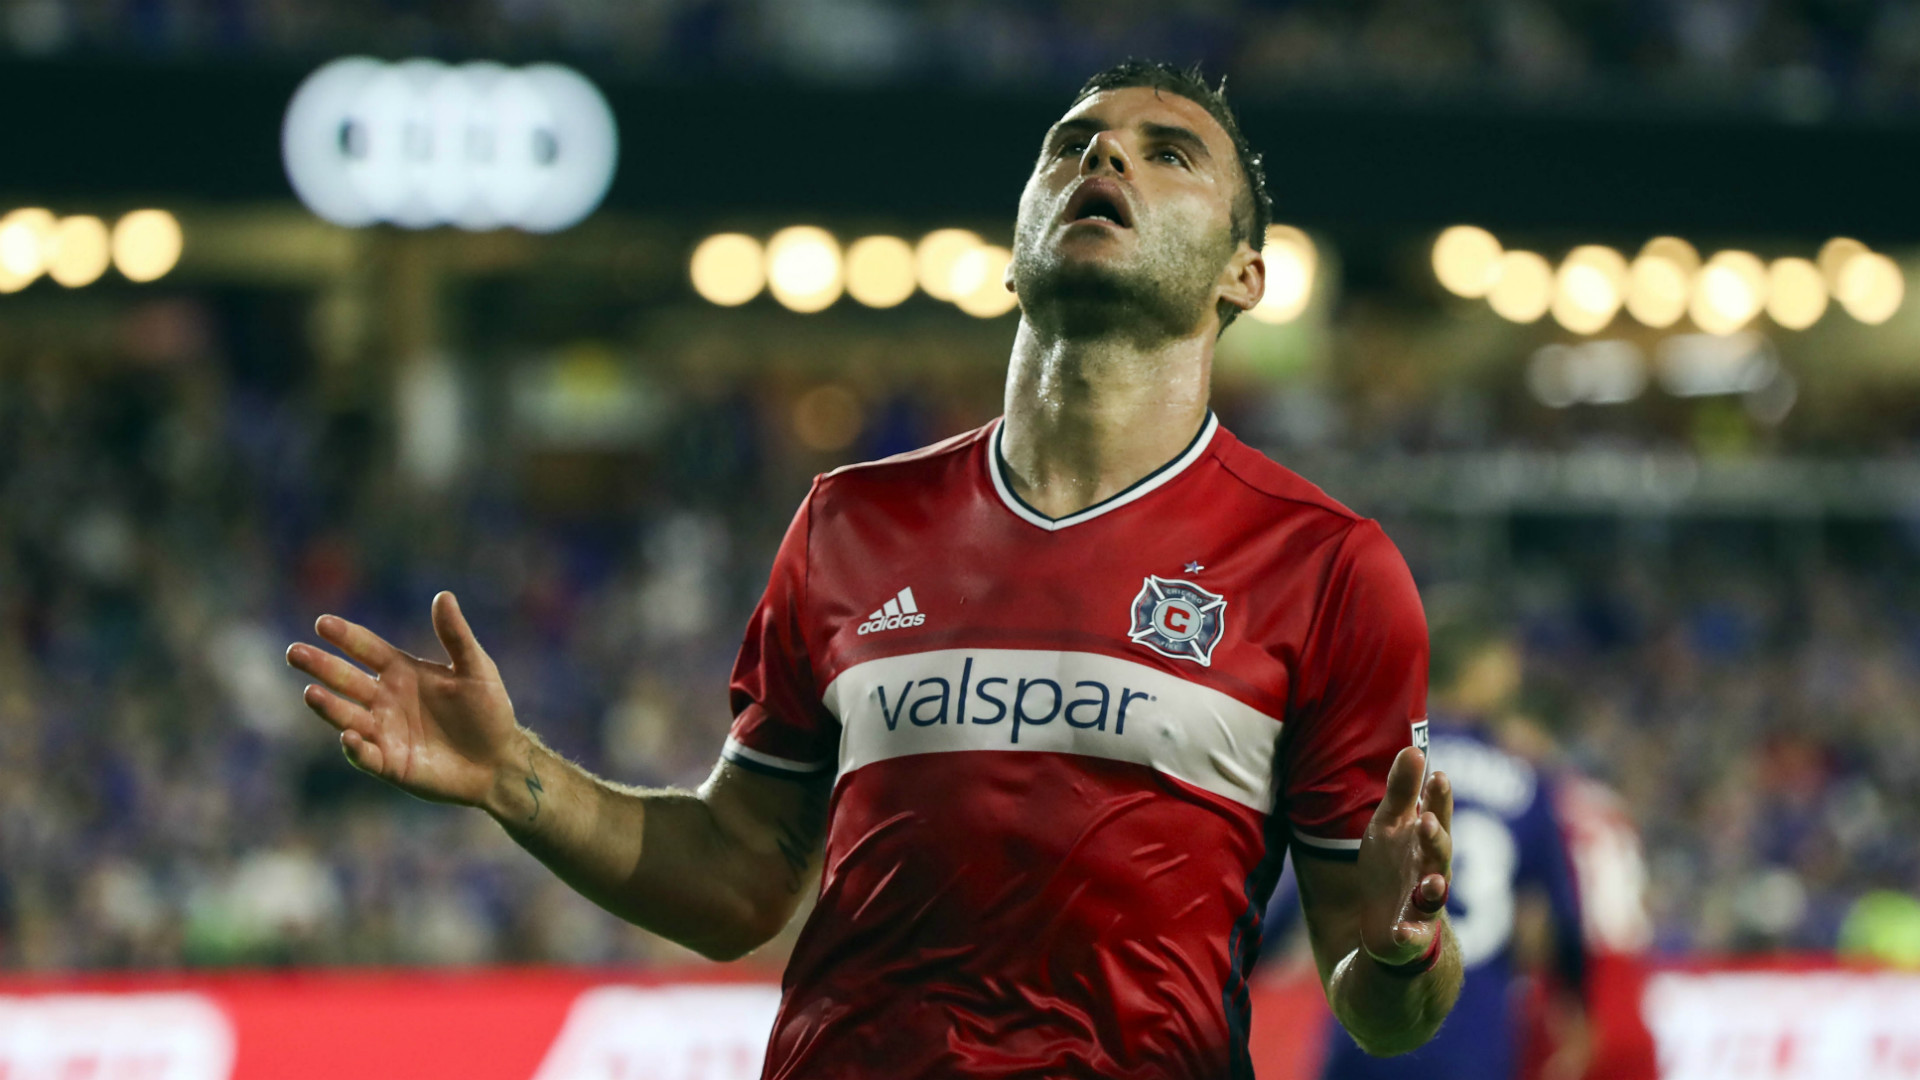 Nemanja Nikolic named Goal's MLS Newcomer of the Year